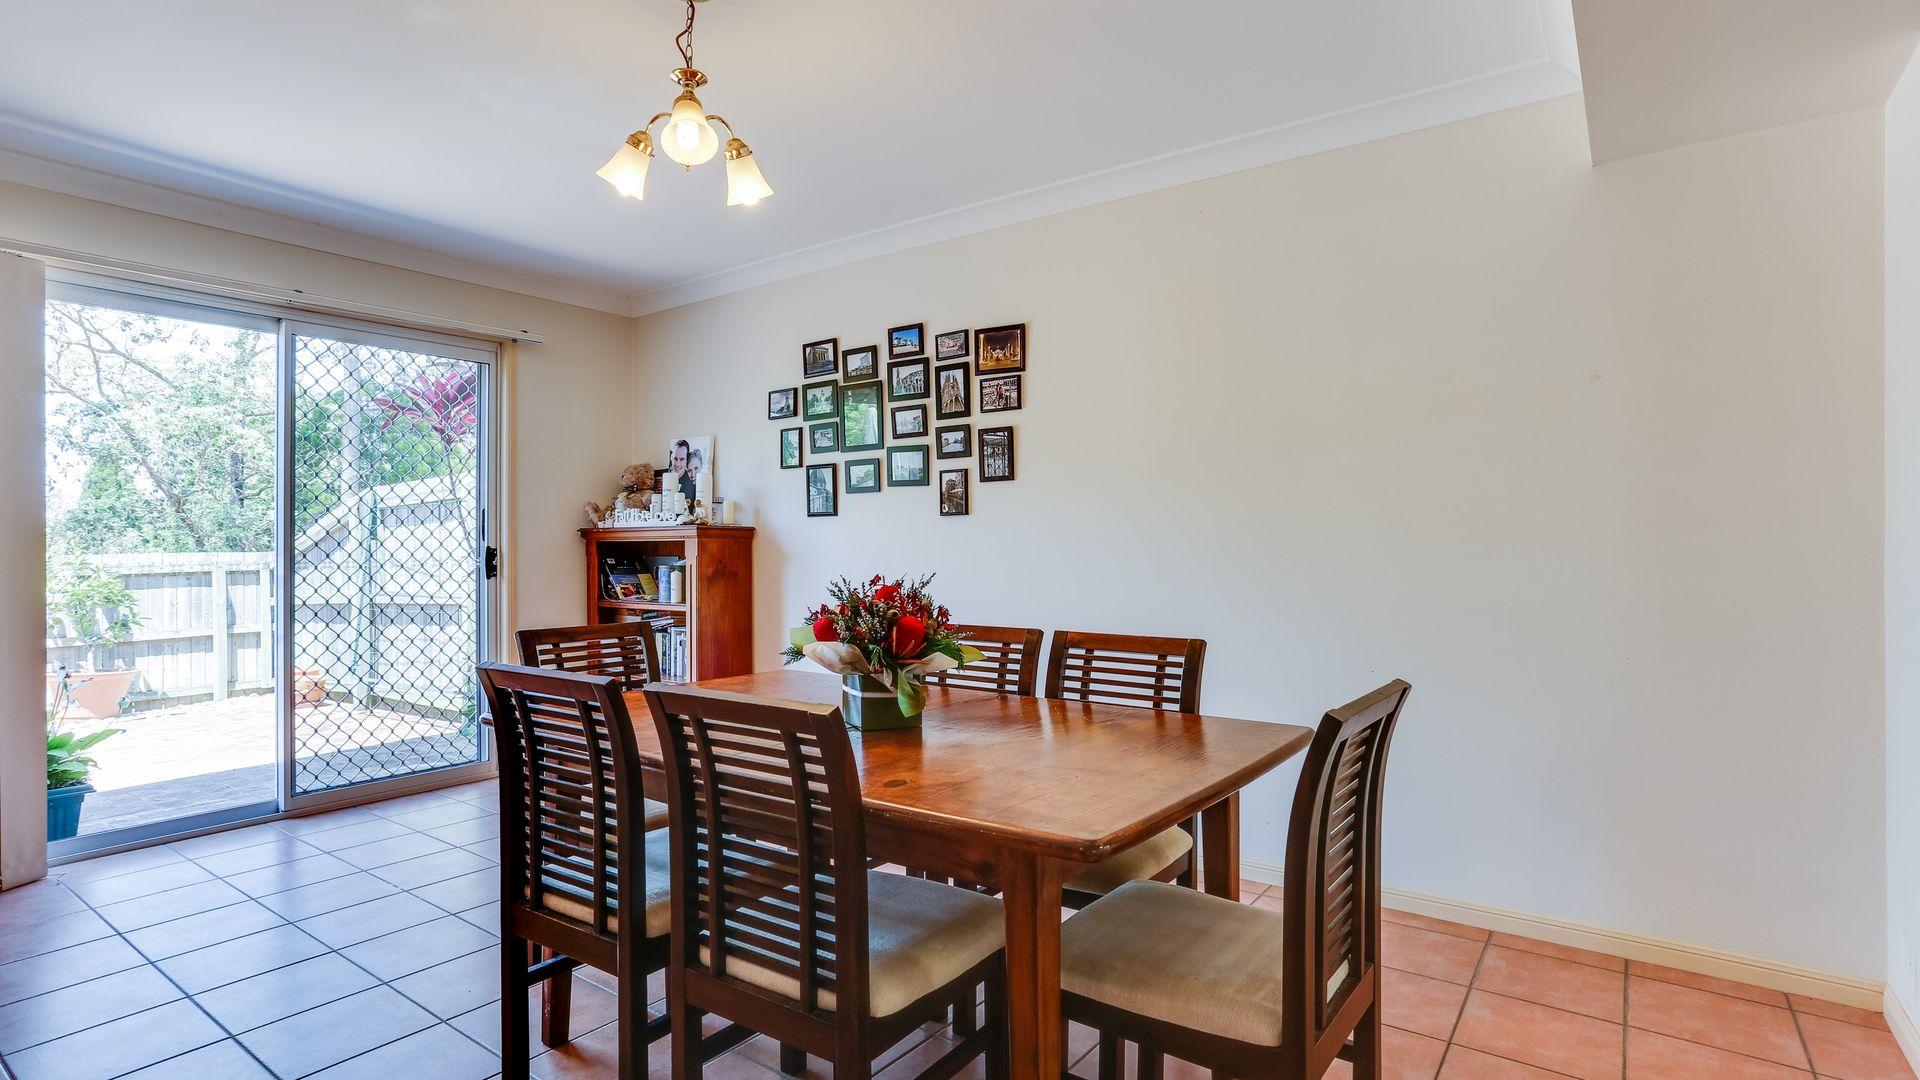 22/580 Seventeen Mile Rocks Rd, Sinnamon Park QLD 4073, Image 2